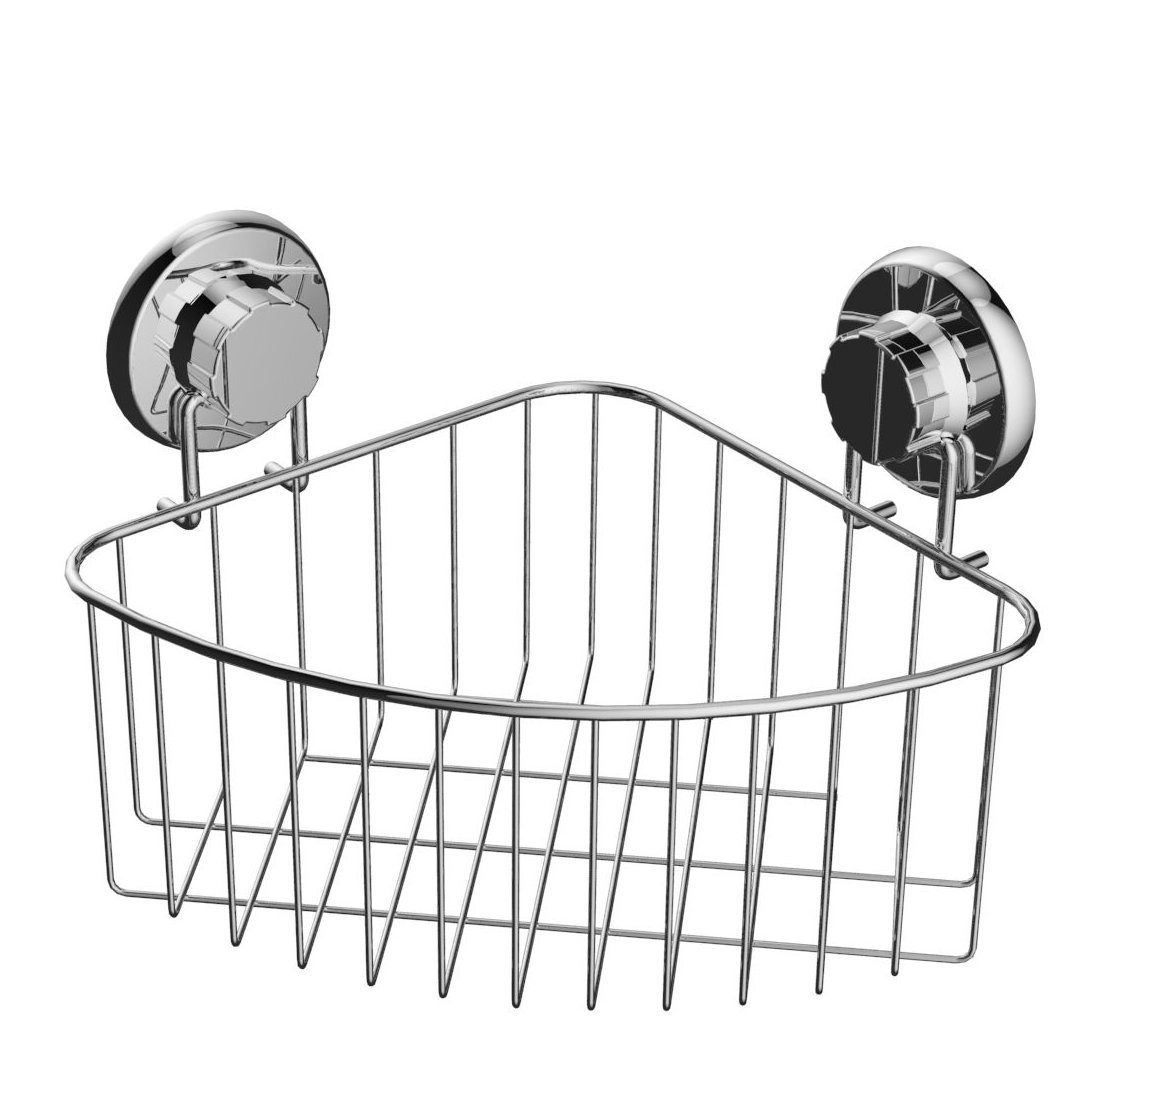 Suction Stainless Steel Corner Rack Bathroom Fitting